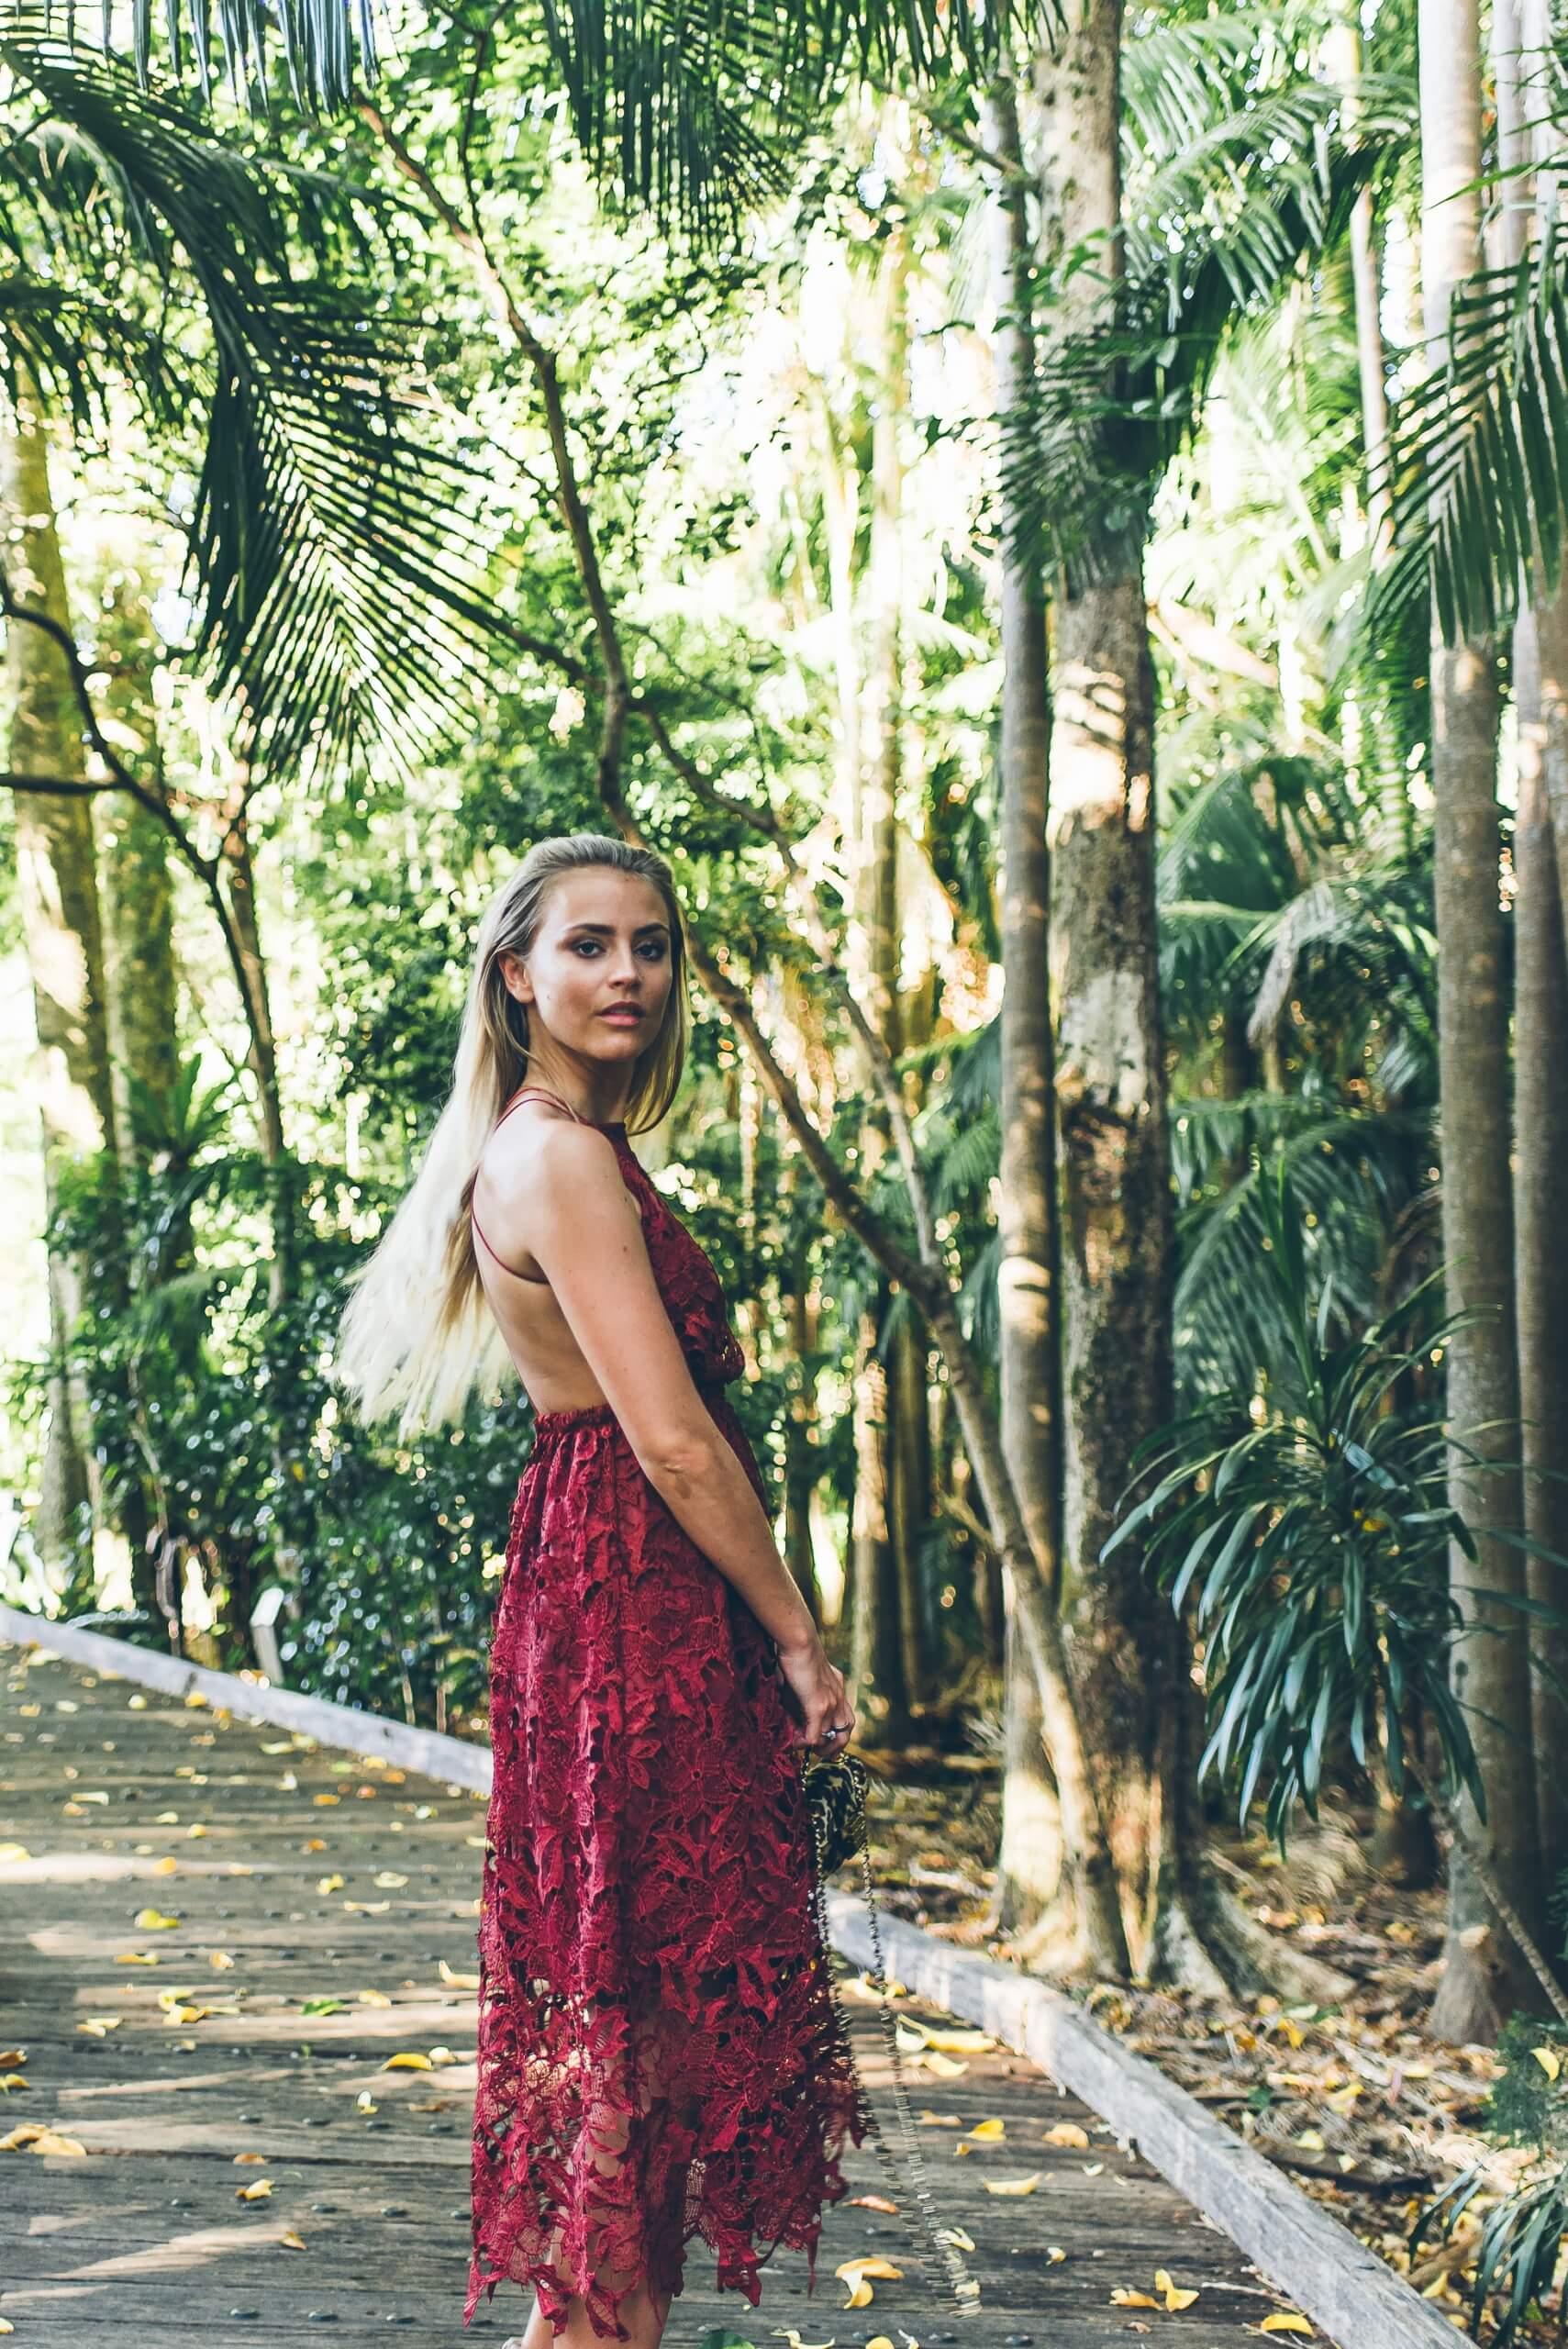 janni-deler-jungle-look-dress-byronDSC_3701